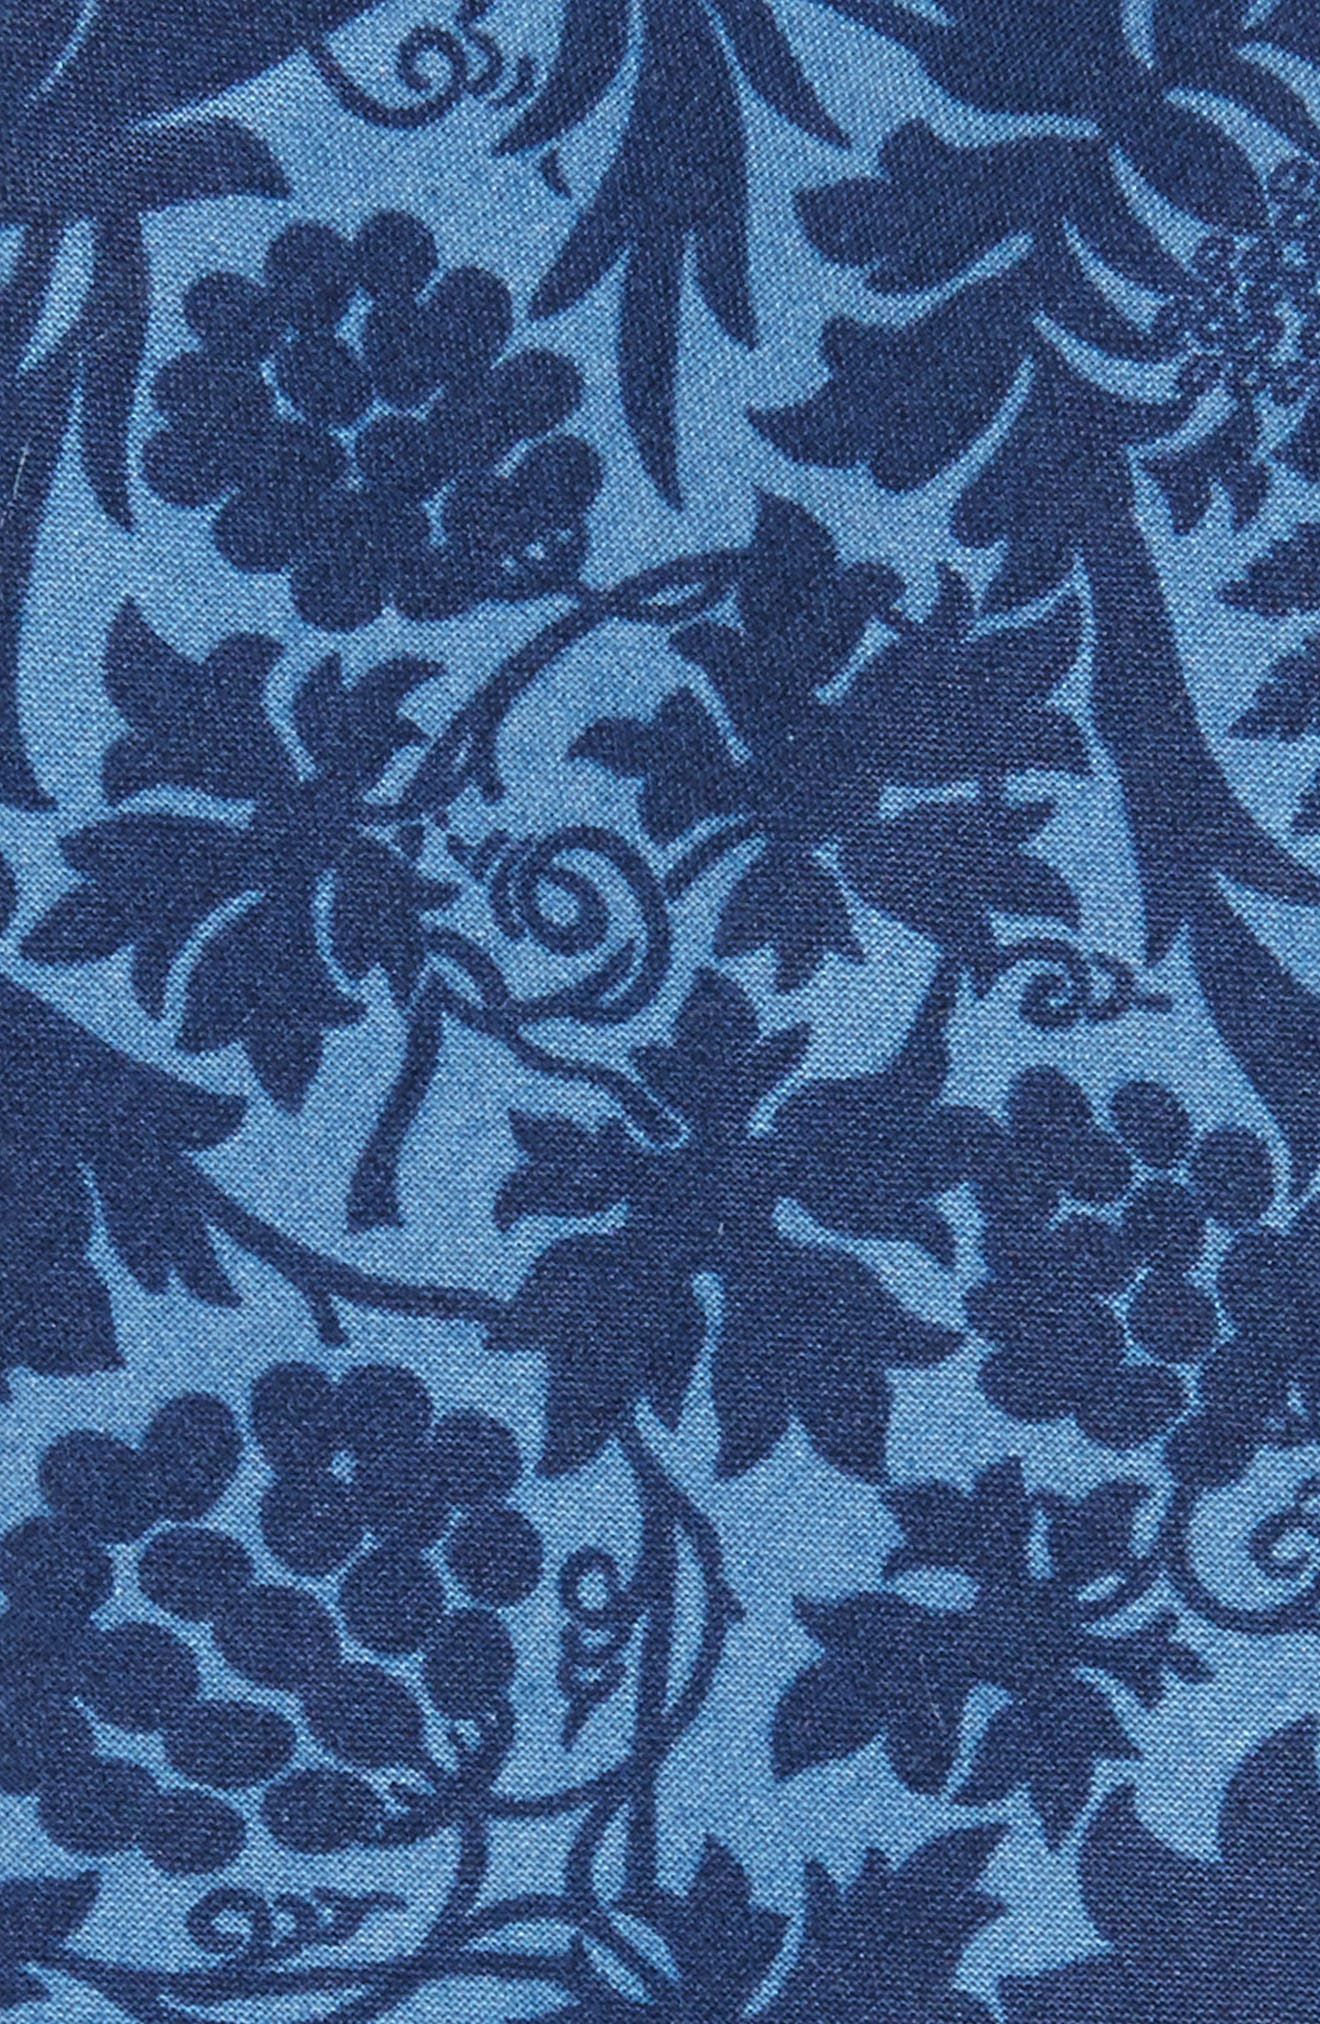 Floral Cotton Skinny Tie,                             Alternate thumbnail 2, color,                             425